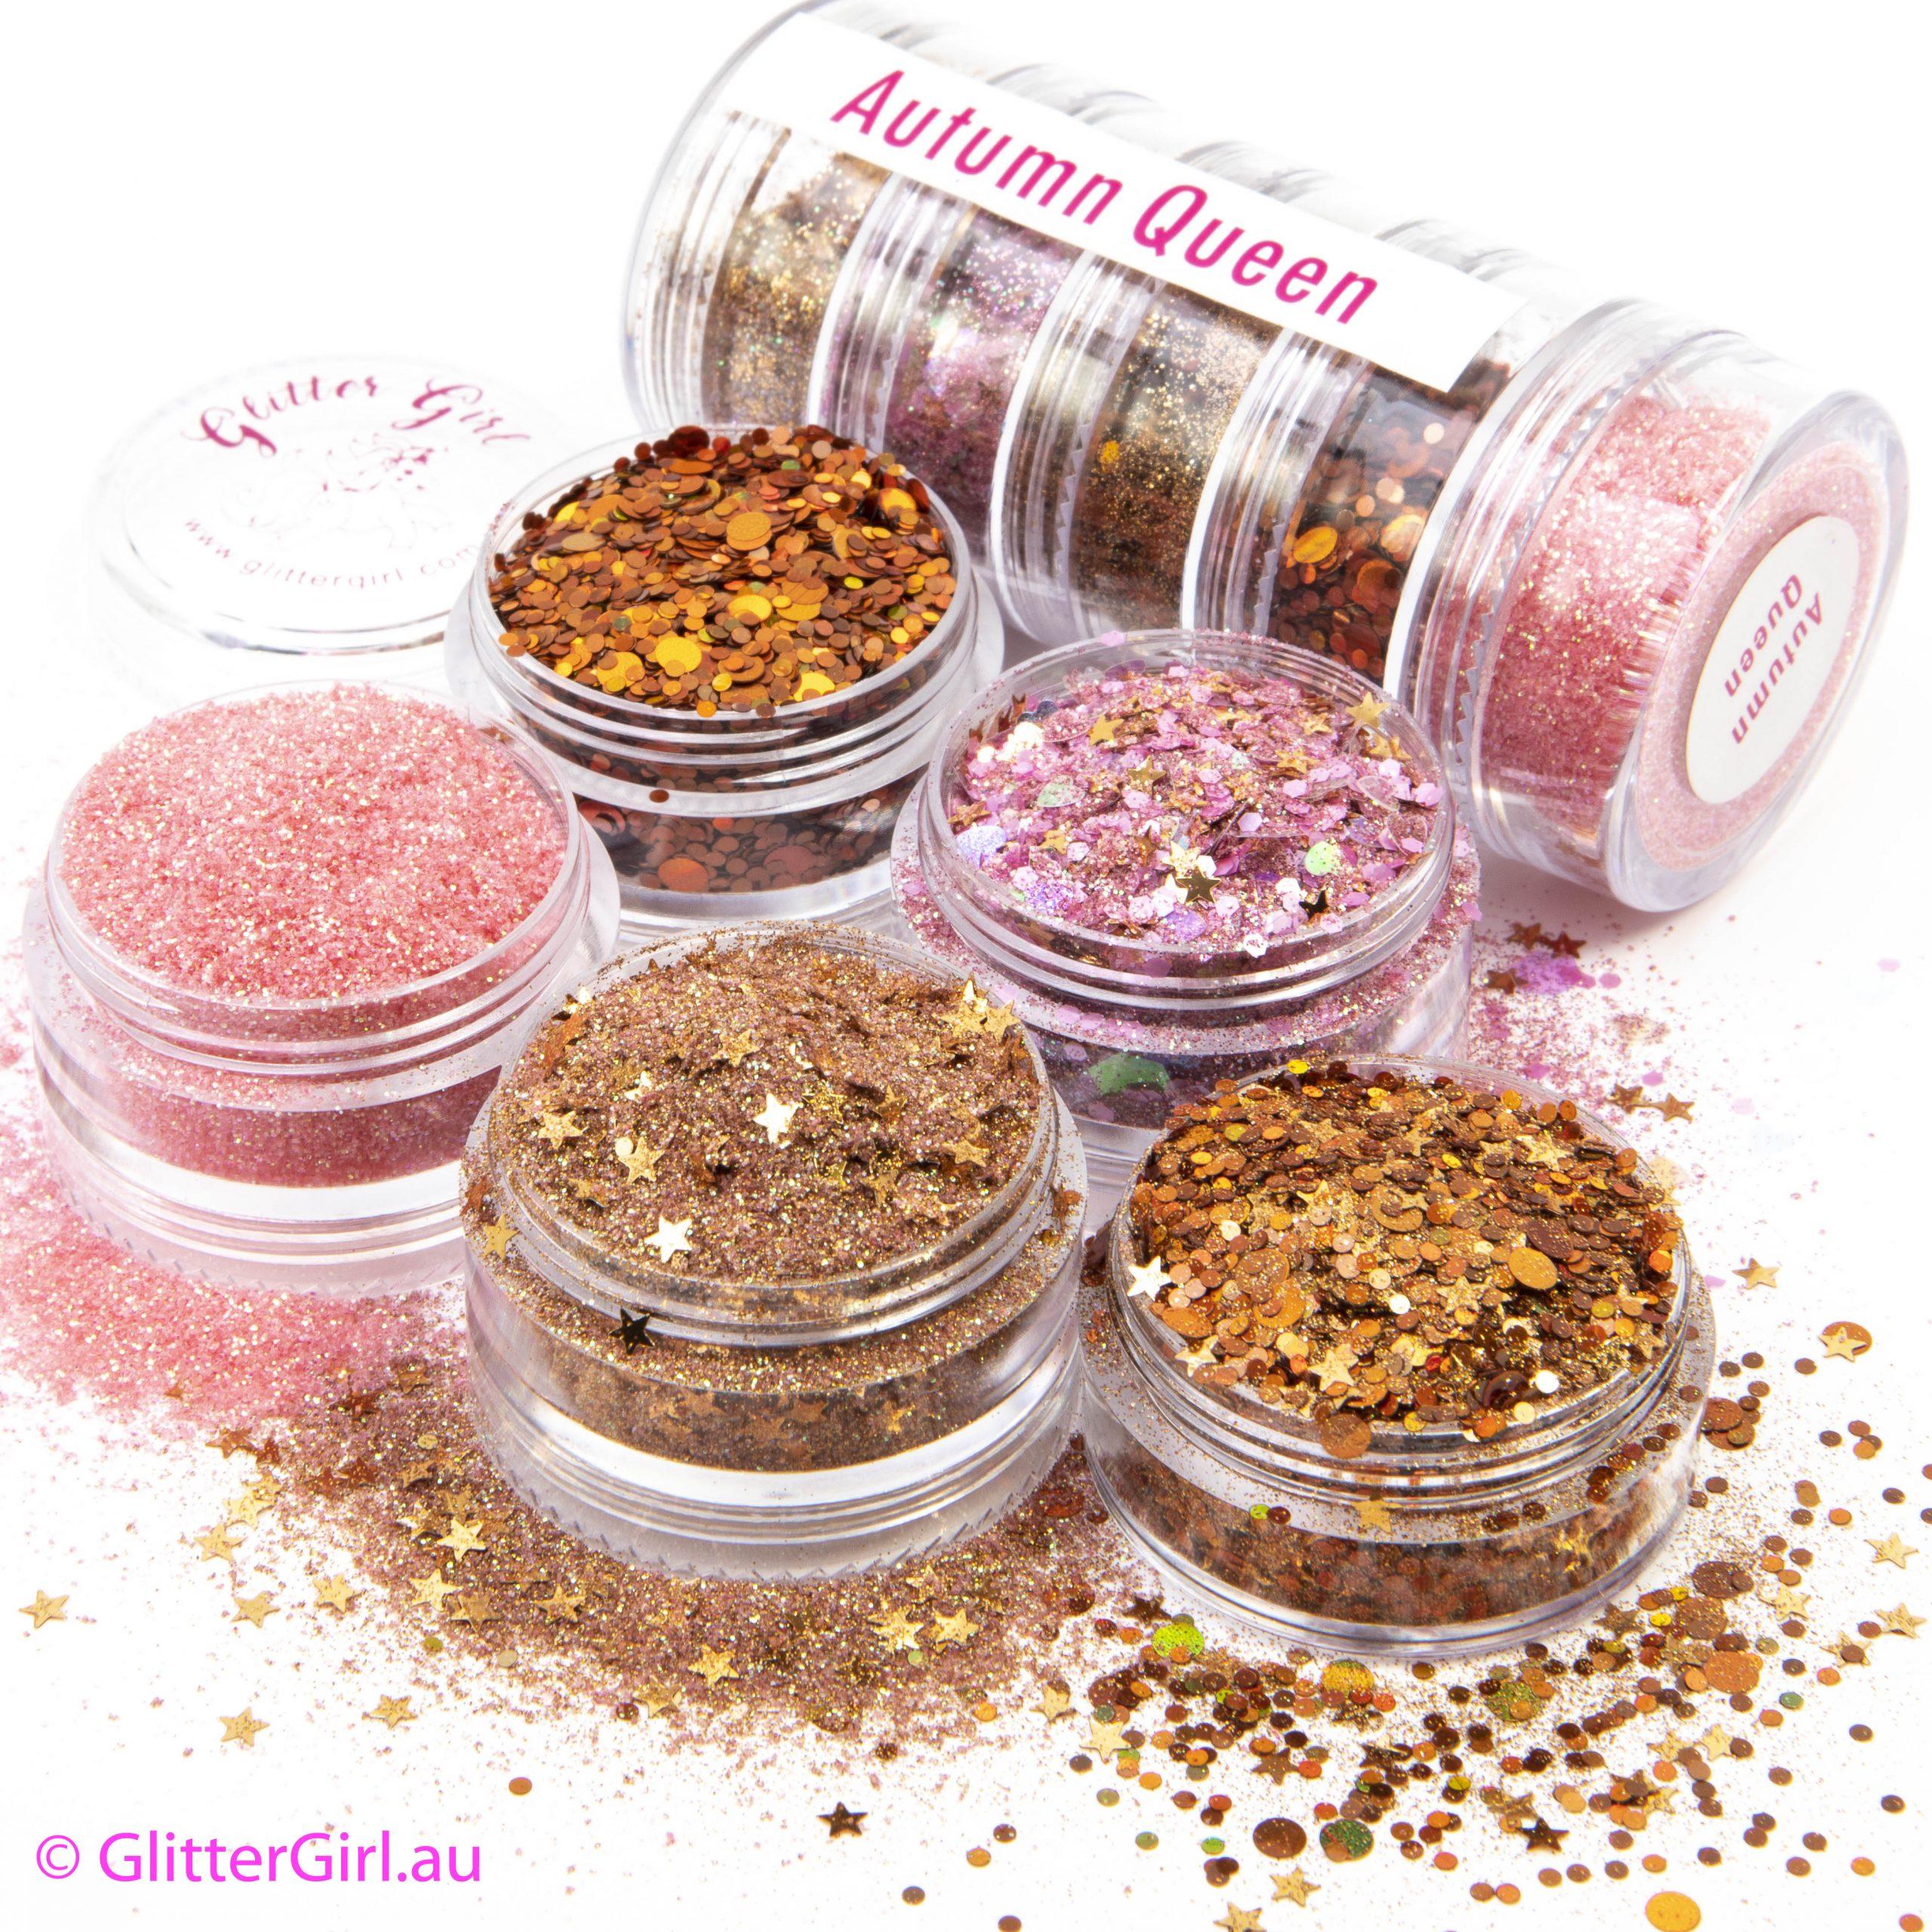 Autumn Queen Collection Eco Glitter Glitter Girl Loose Glitter